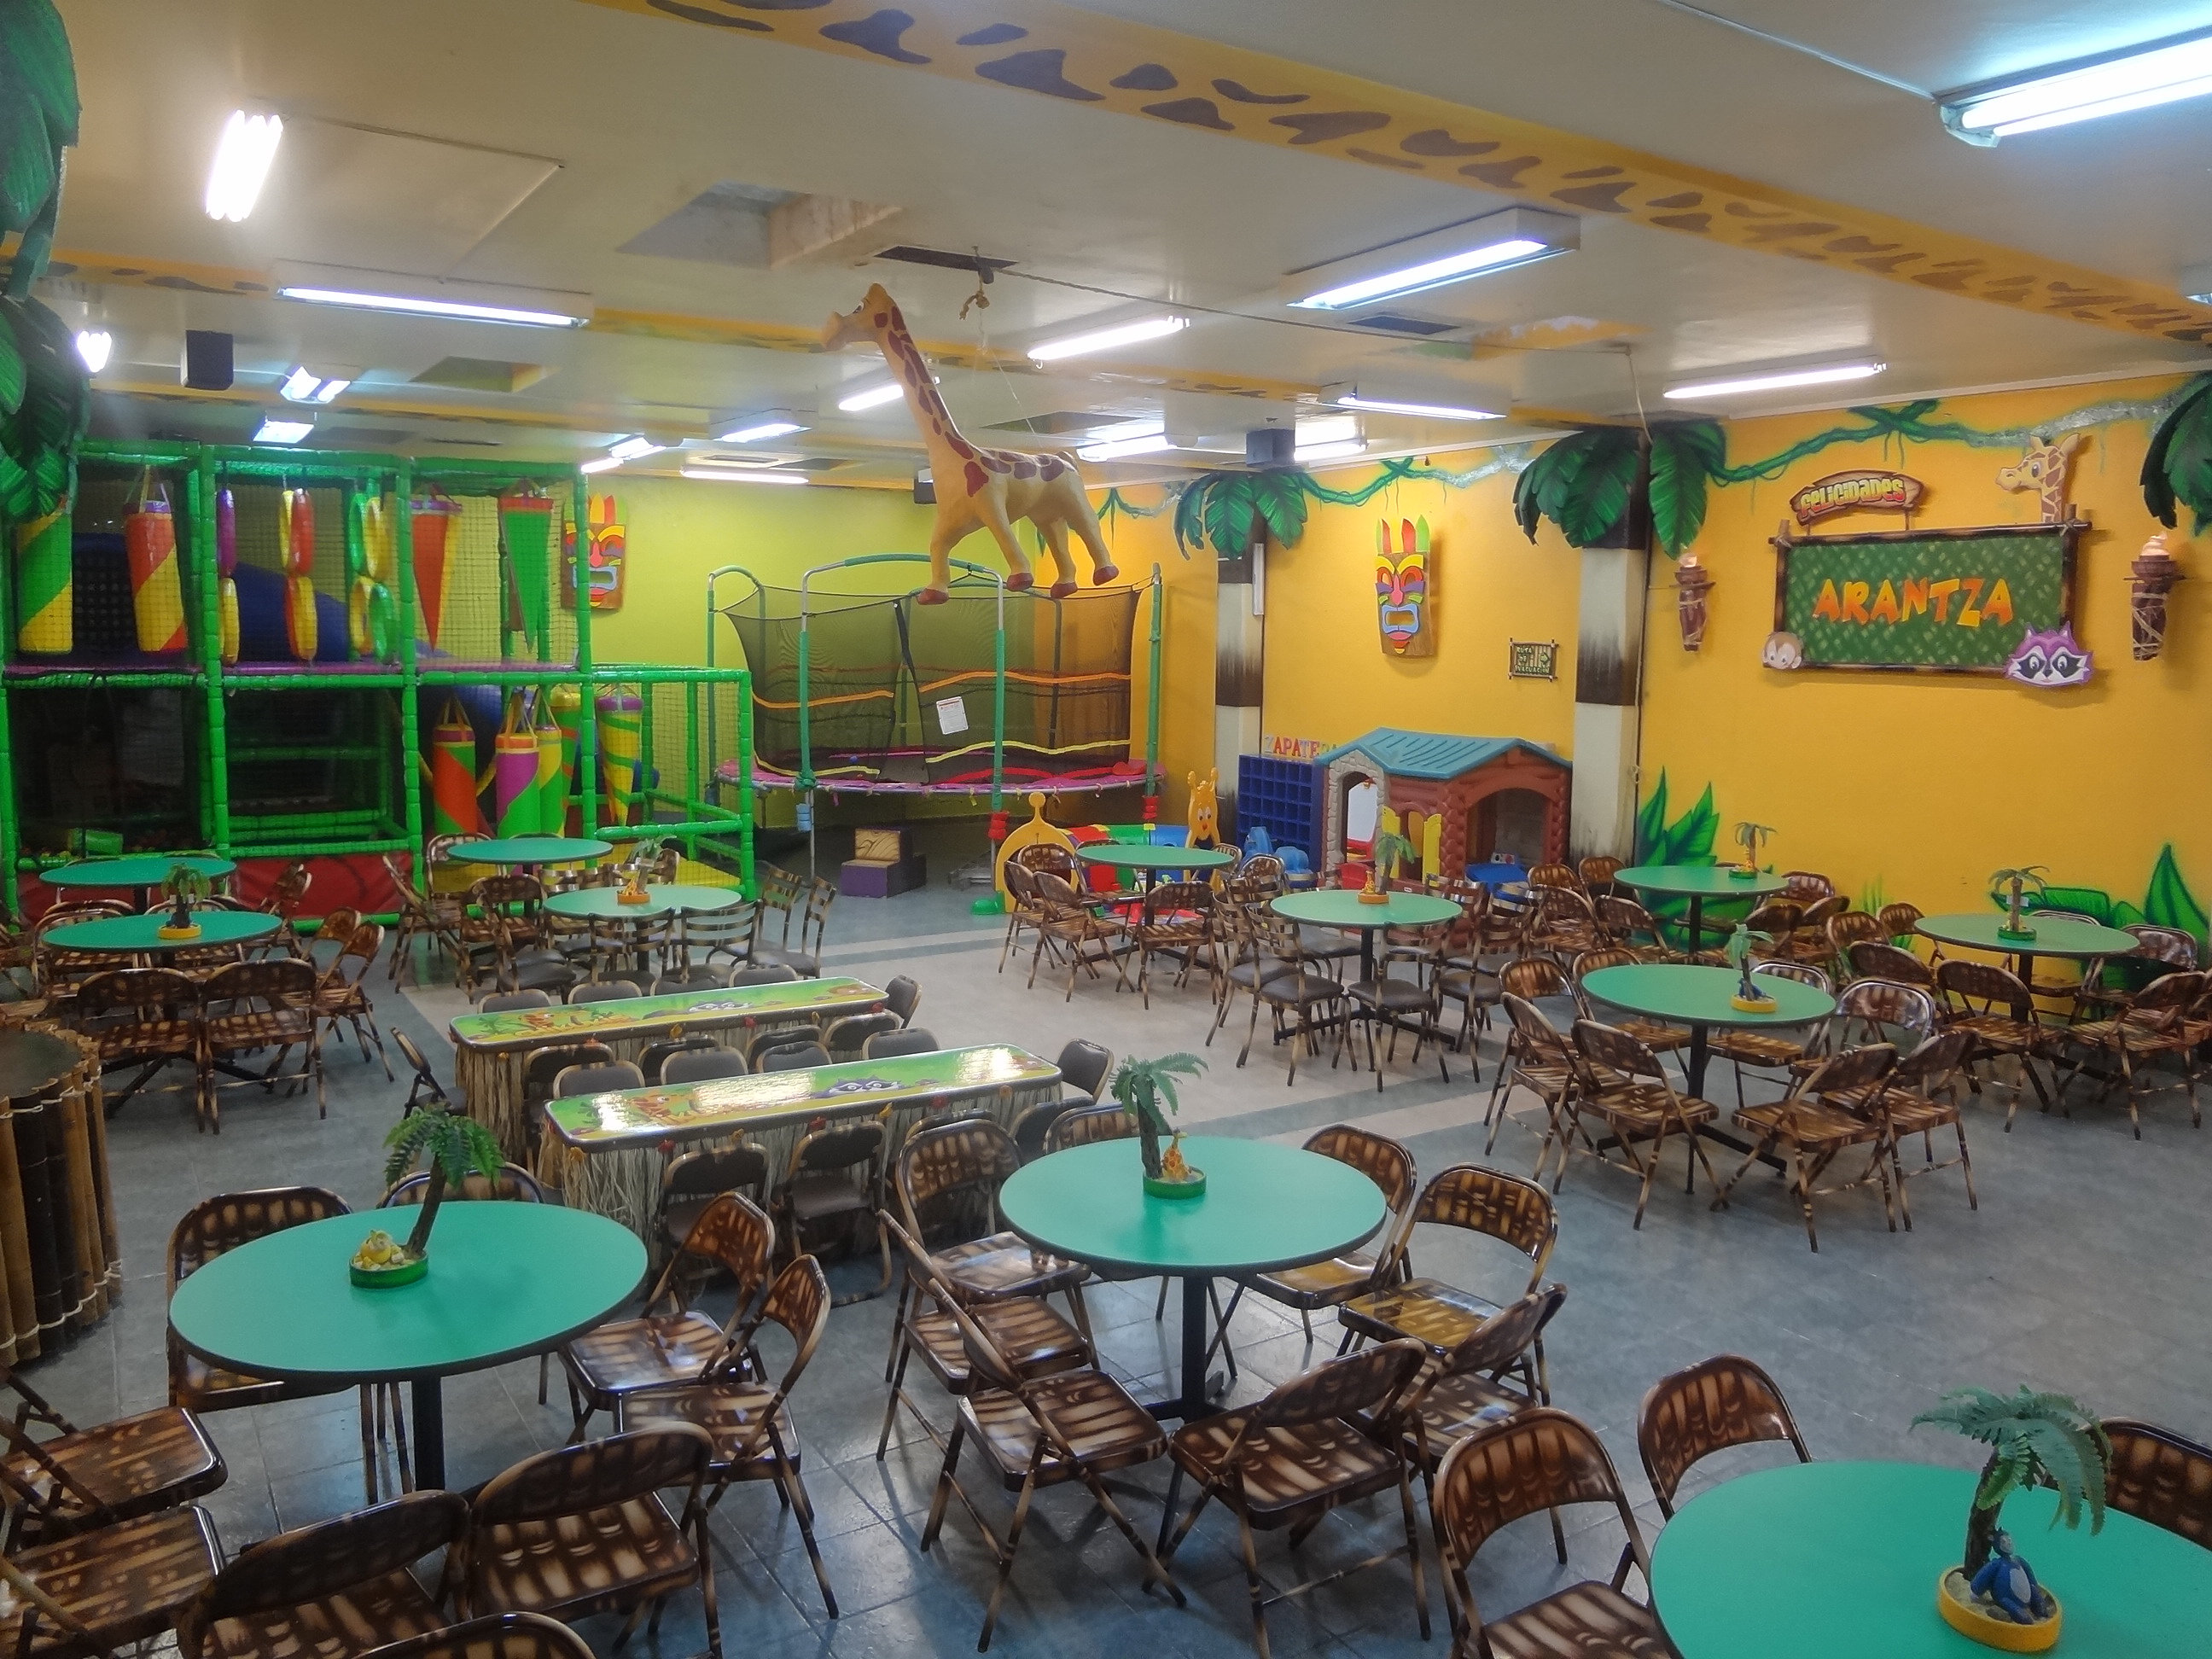 Salon de fiestas infantiles chikukis salones para fiestas for Acuario salon de fiestas